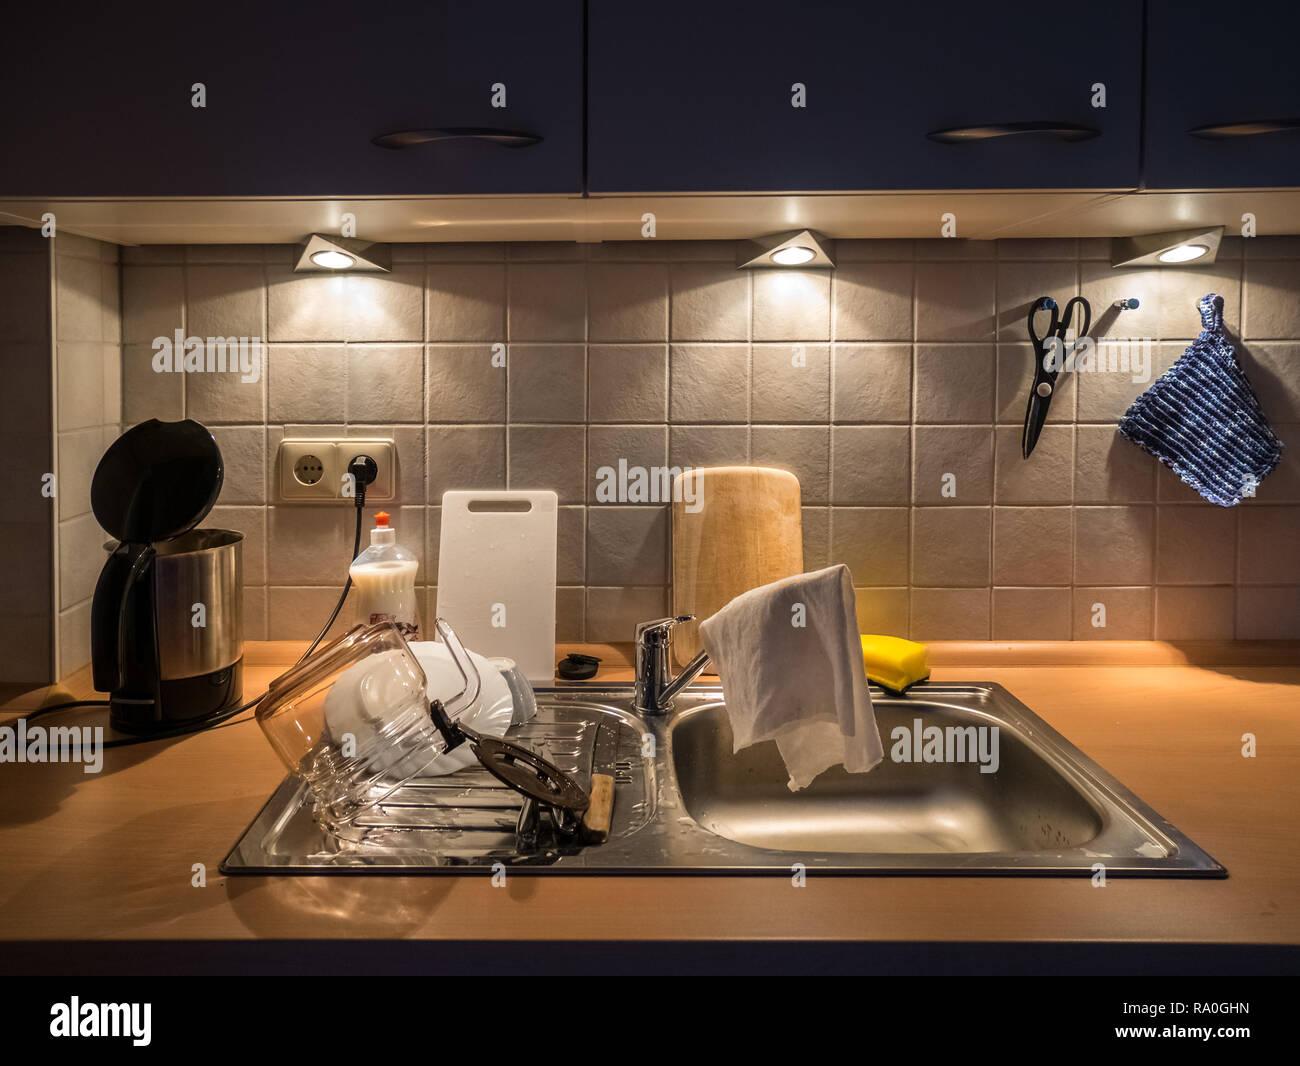 Spot Au Dessus Evier Cuisine kettle holder photos & kettle holder images - alamy